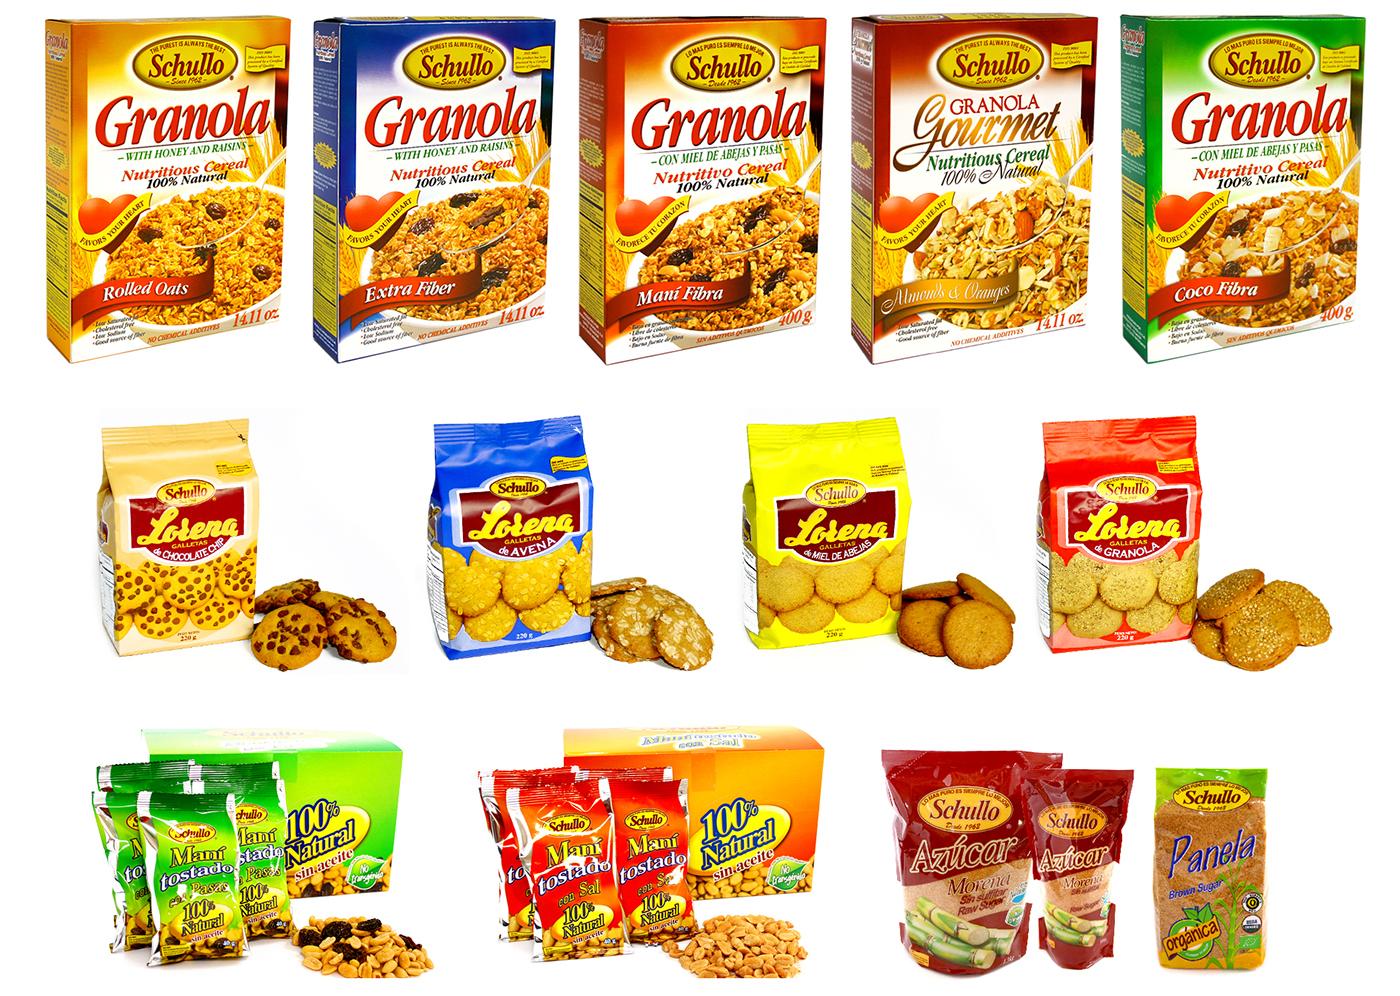 empaques marcas brandings Ecuador quito guayaquil logos granola Natural products packing